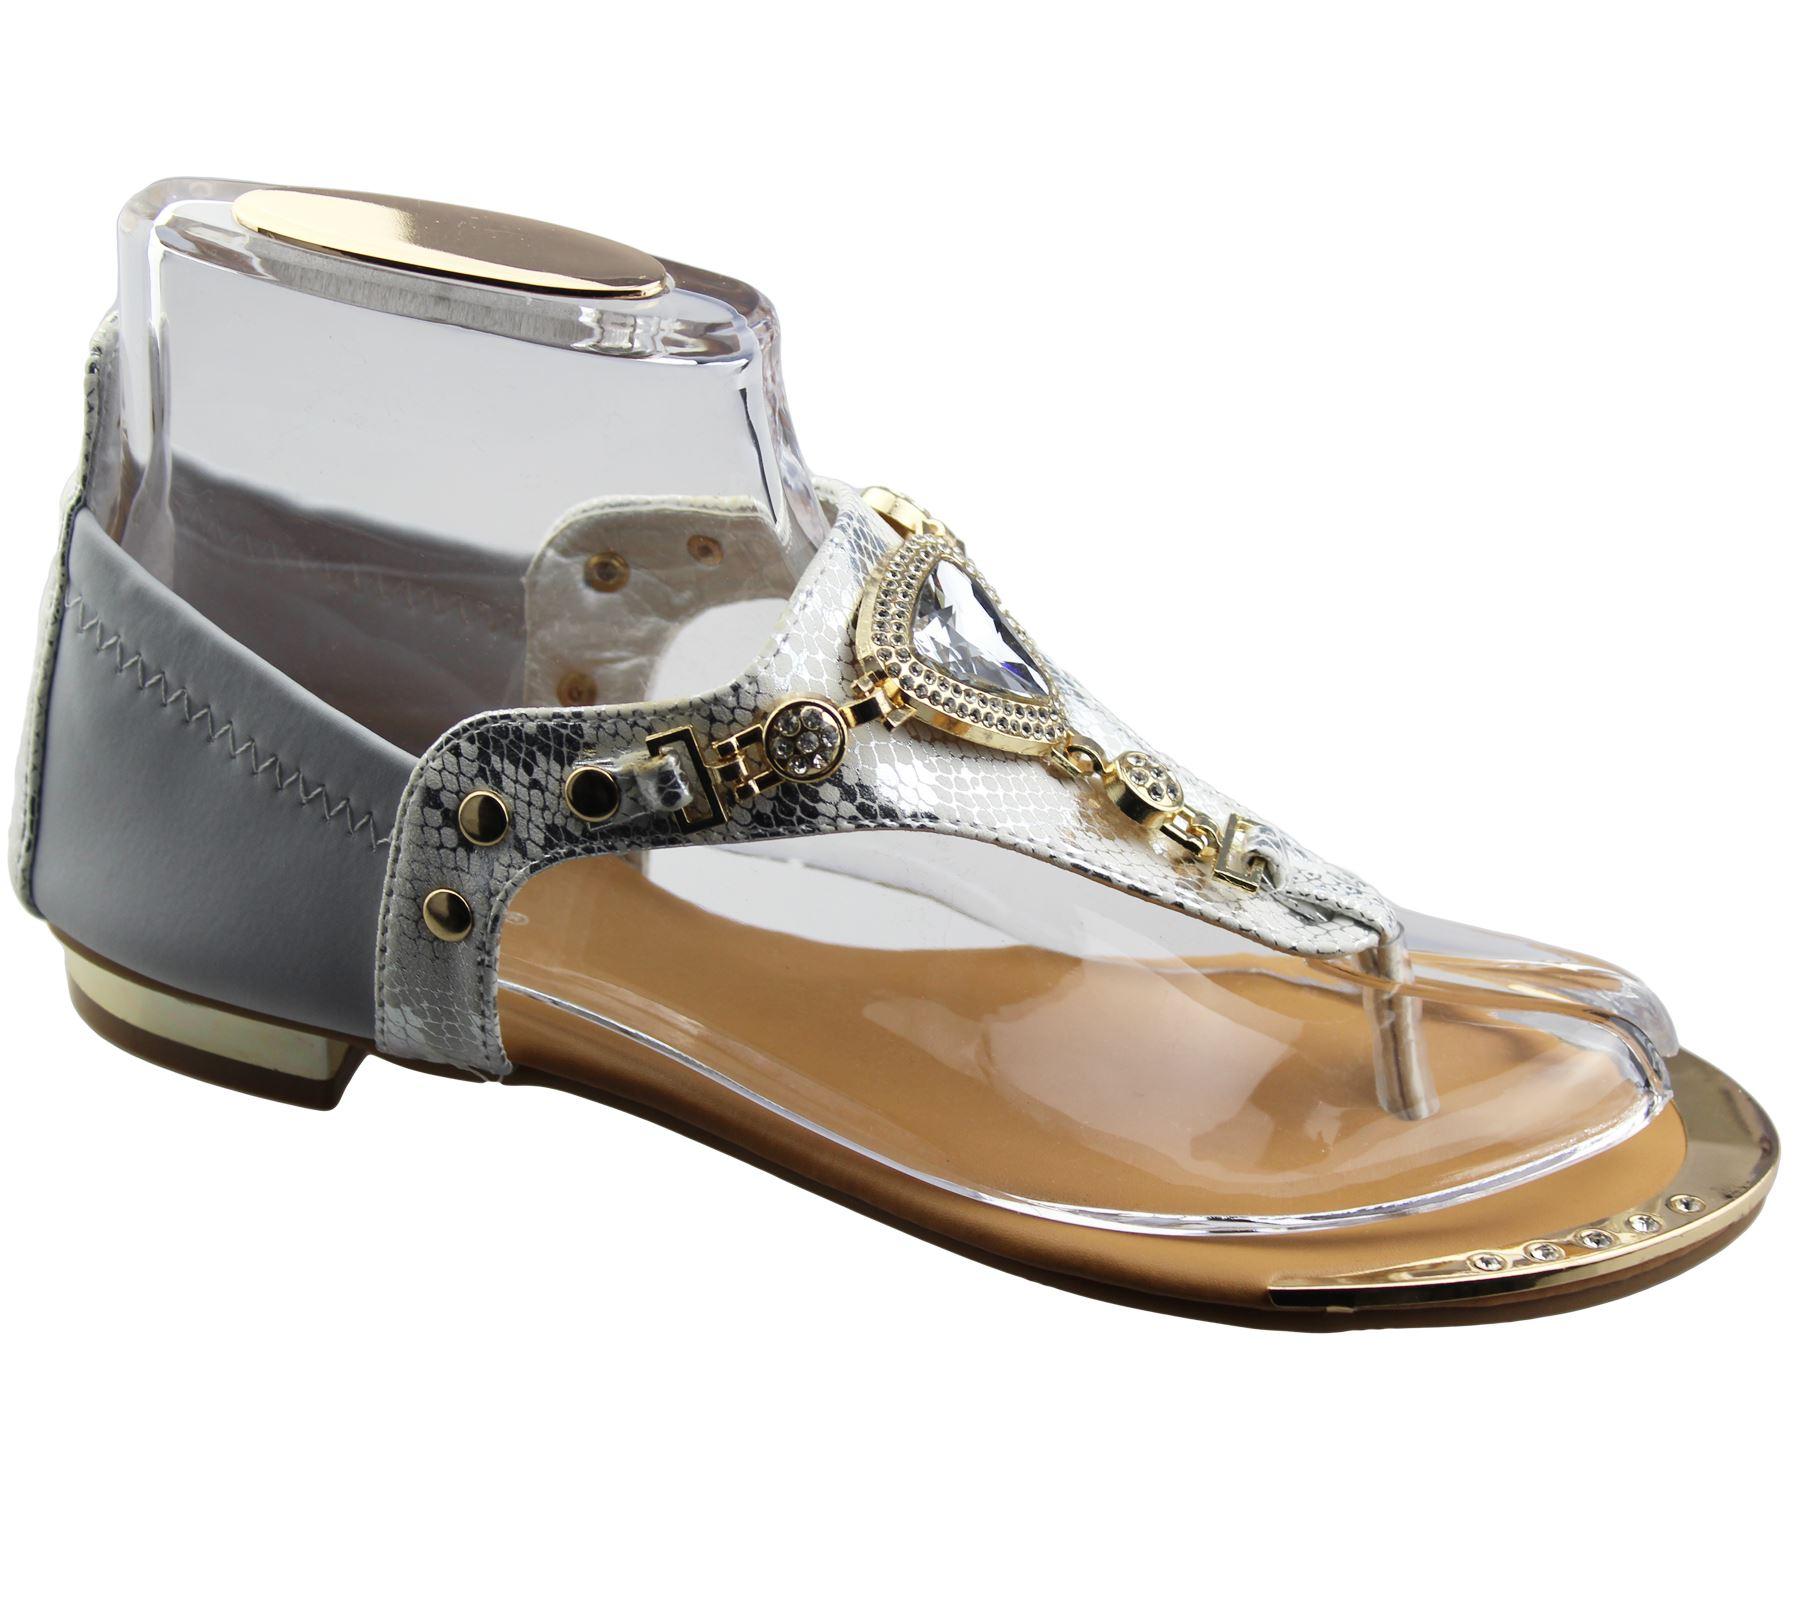 Womens-Flat-Summer-Sandals-Ladies-Diamante-Wedding-Toe-Post-Casual-Slipper thumbnail 13